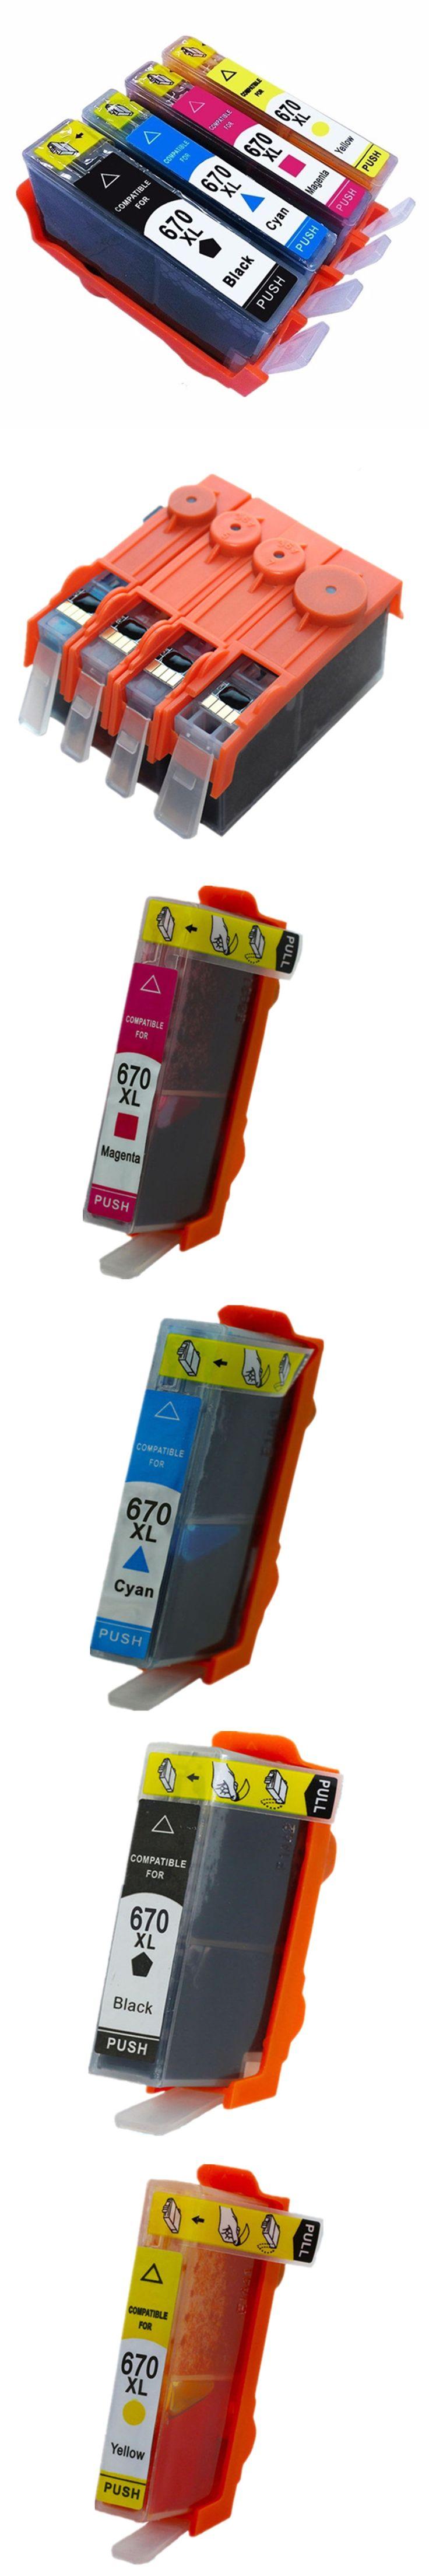 1Set 4Pk Inkjet Ink Cartridges For HP HP670 670 XL 670XL HP670XL CZ117AL Deskjet Advantage 3525 4615 4625 5525 6520 6525 Printer